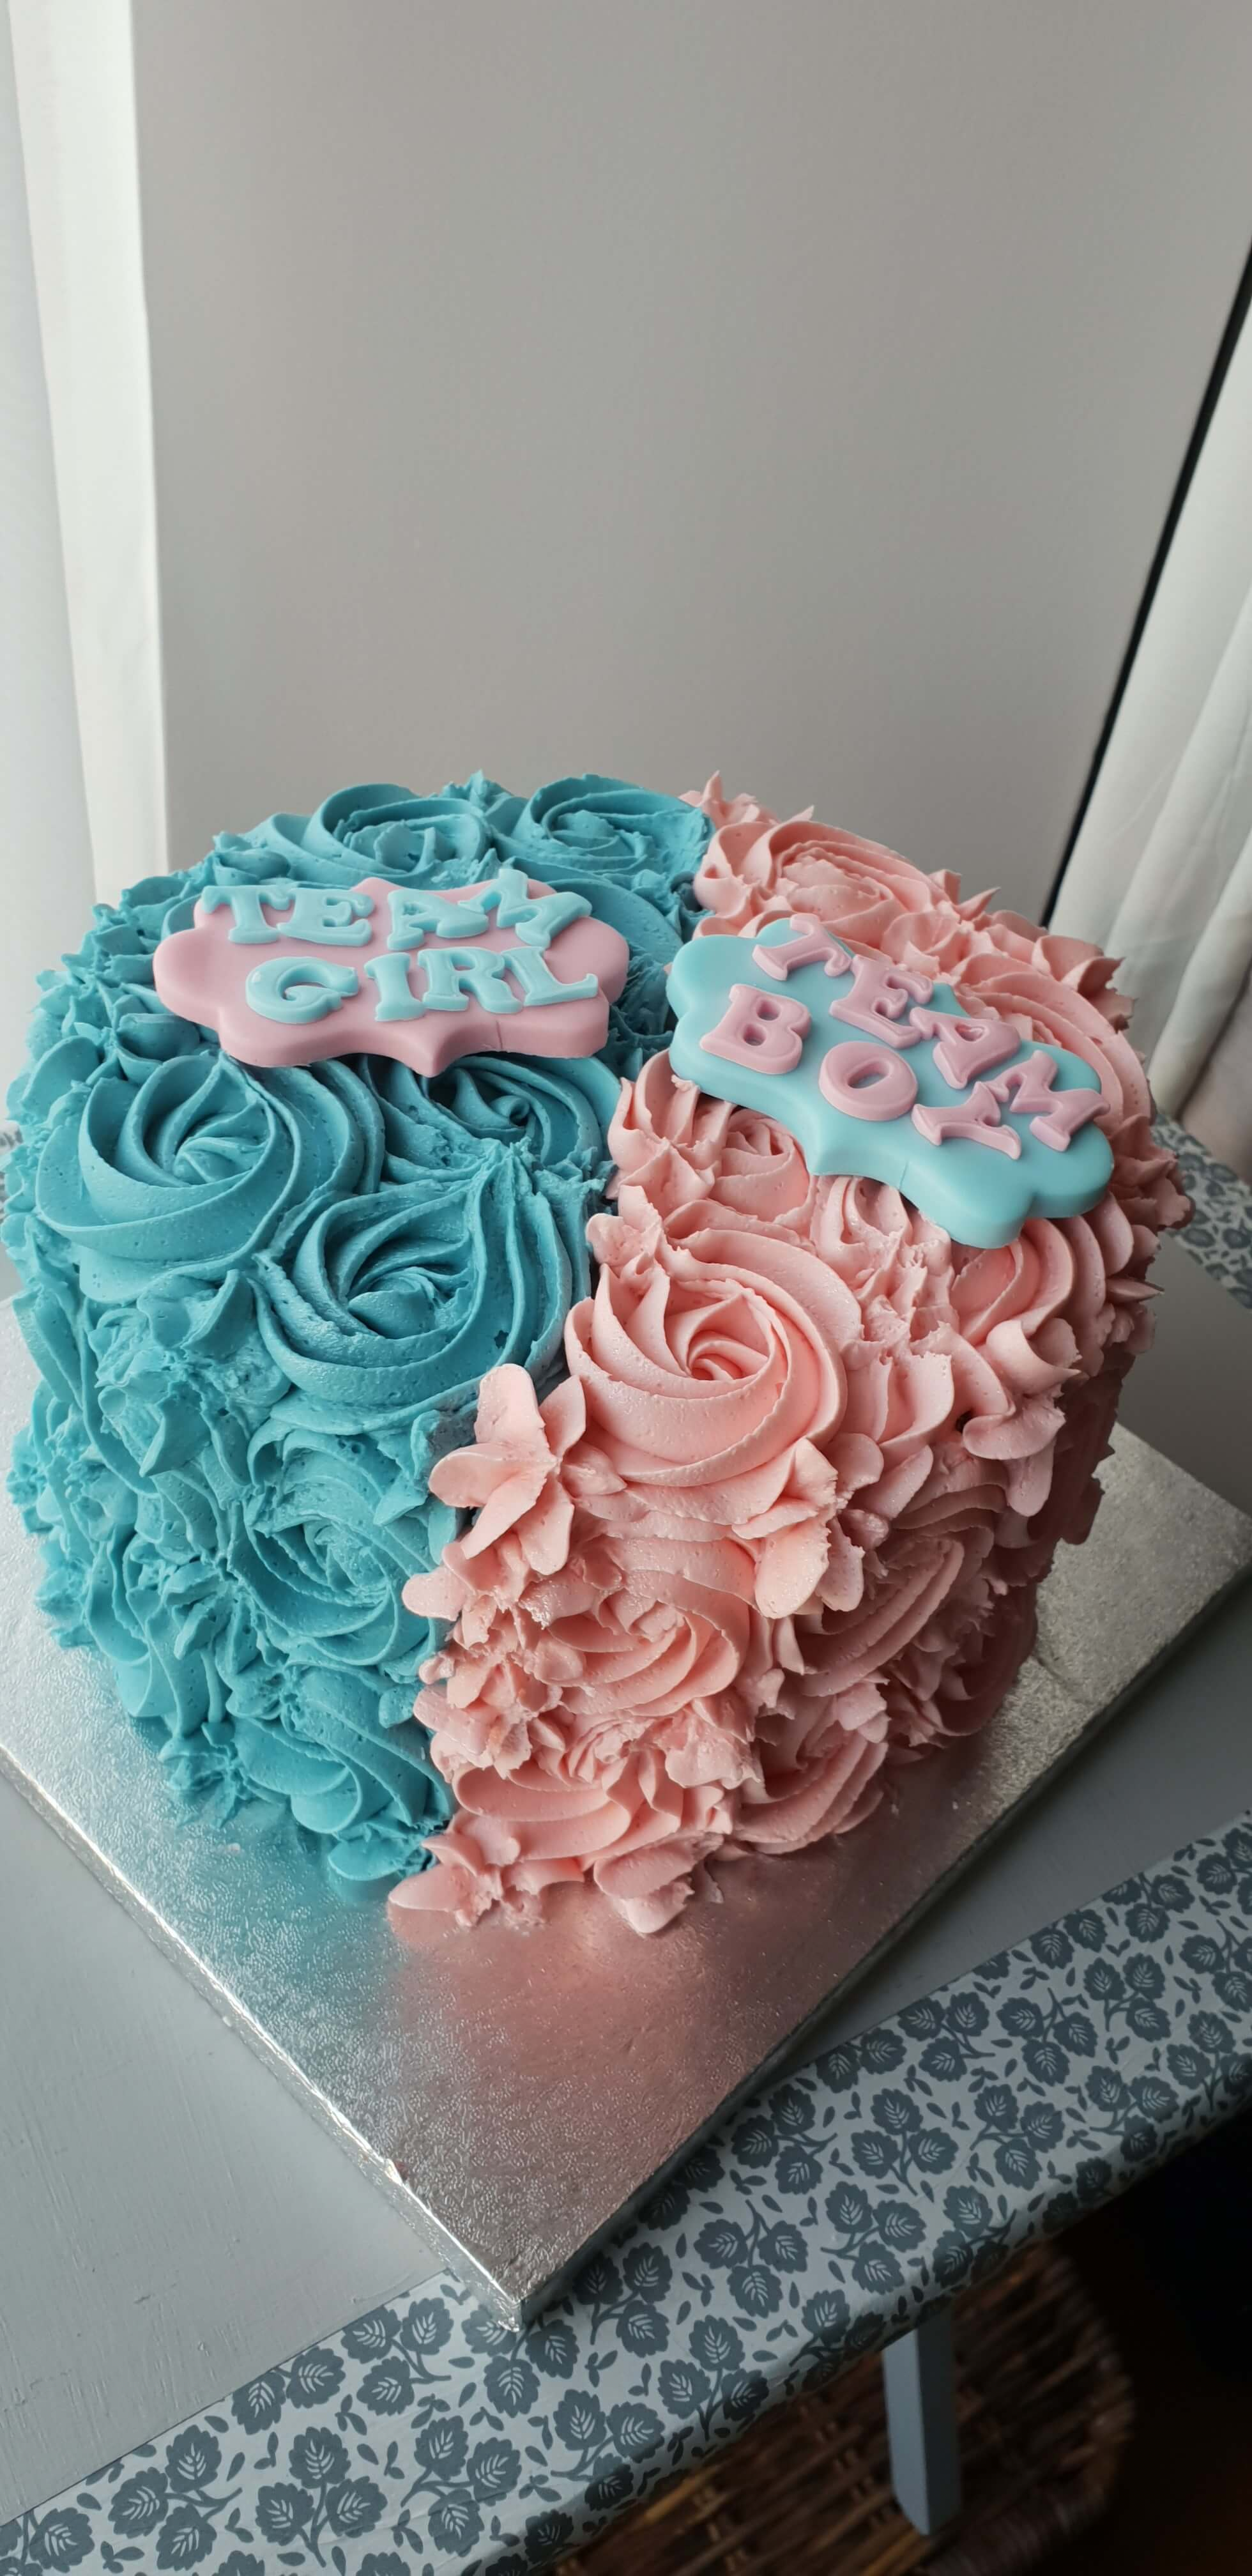 Fab Gender Reveal Cake